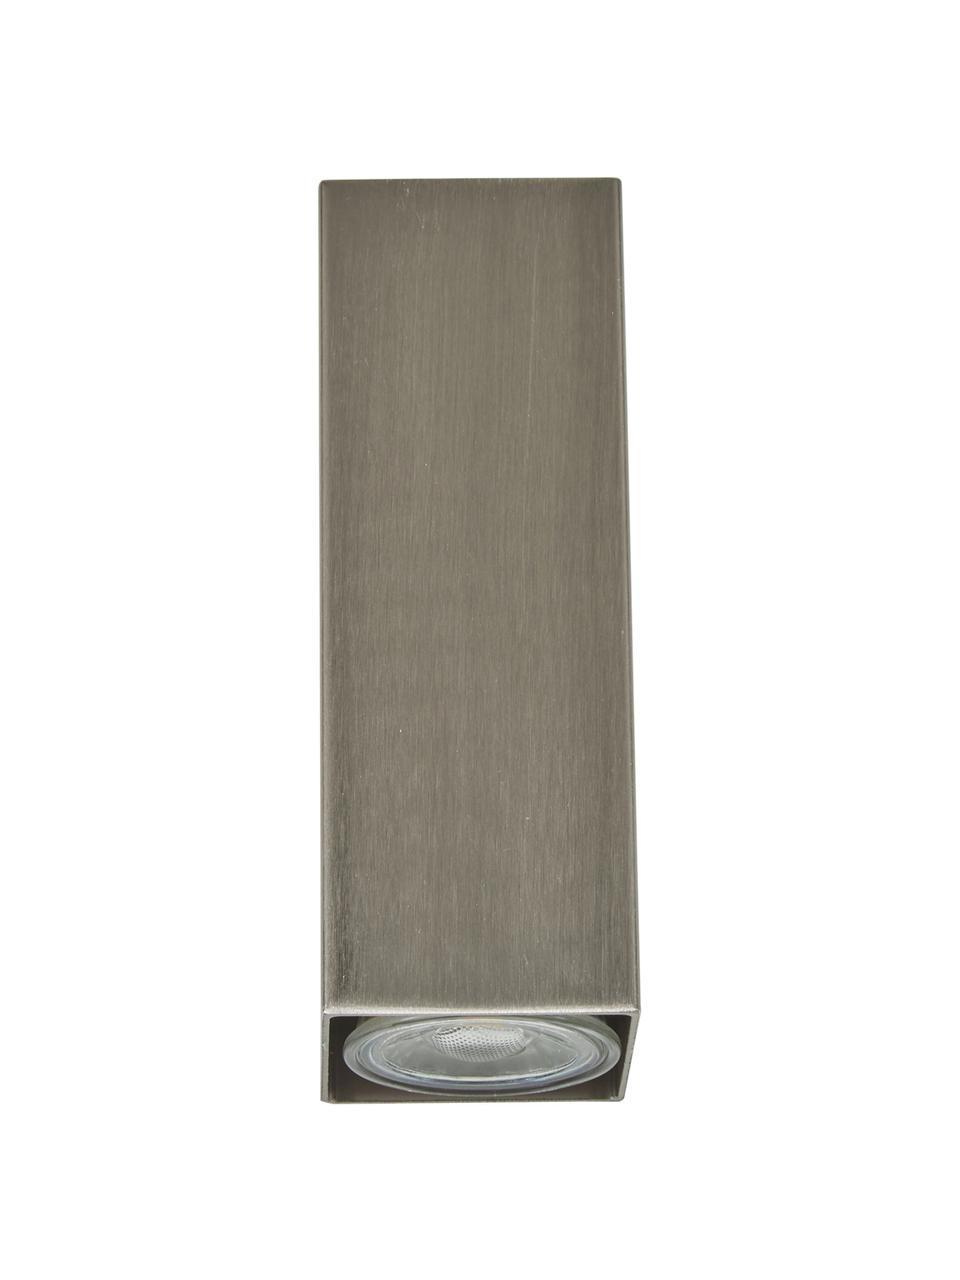 Applique a LED Peter, Paralume: metallo cromato, Cromo, Ø 5 x Alt. 8 cm